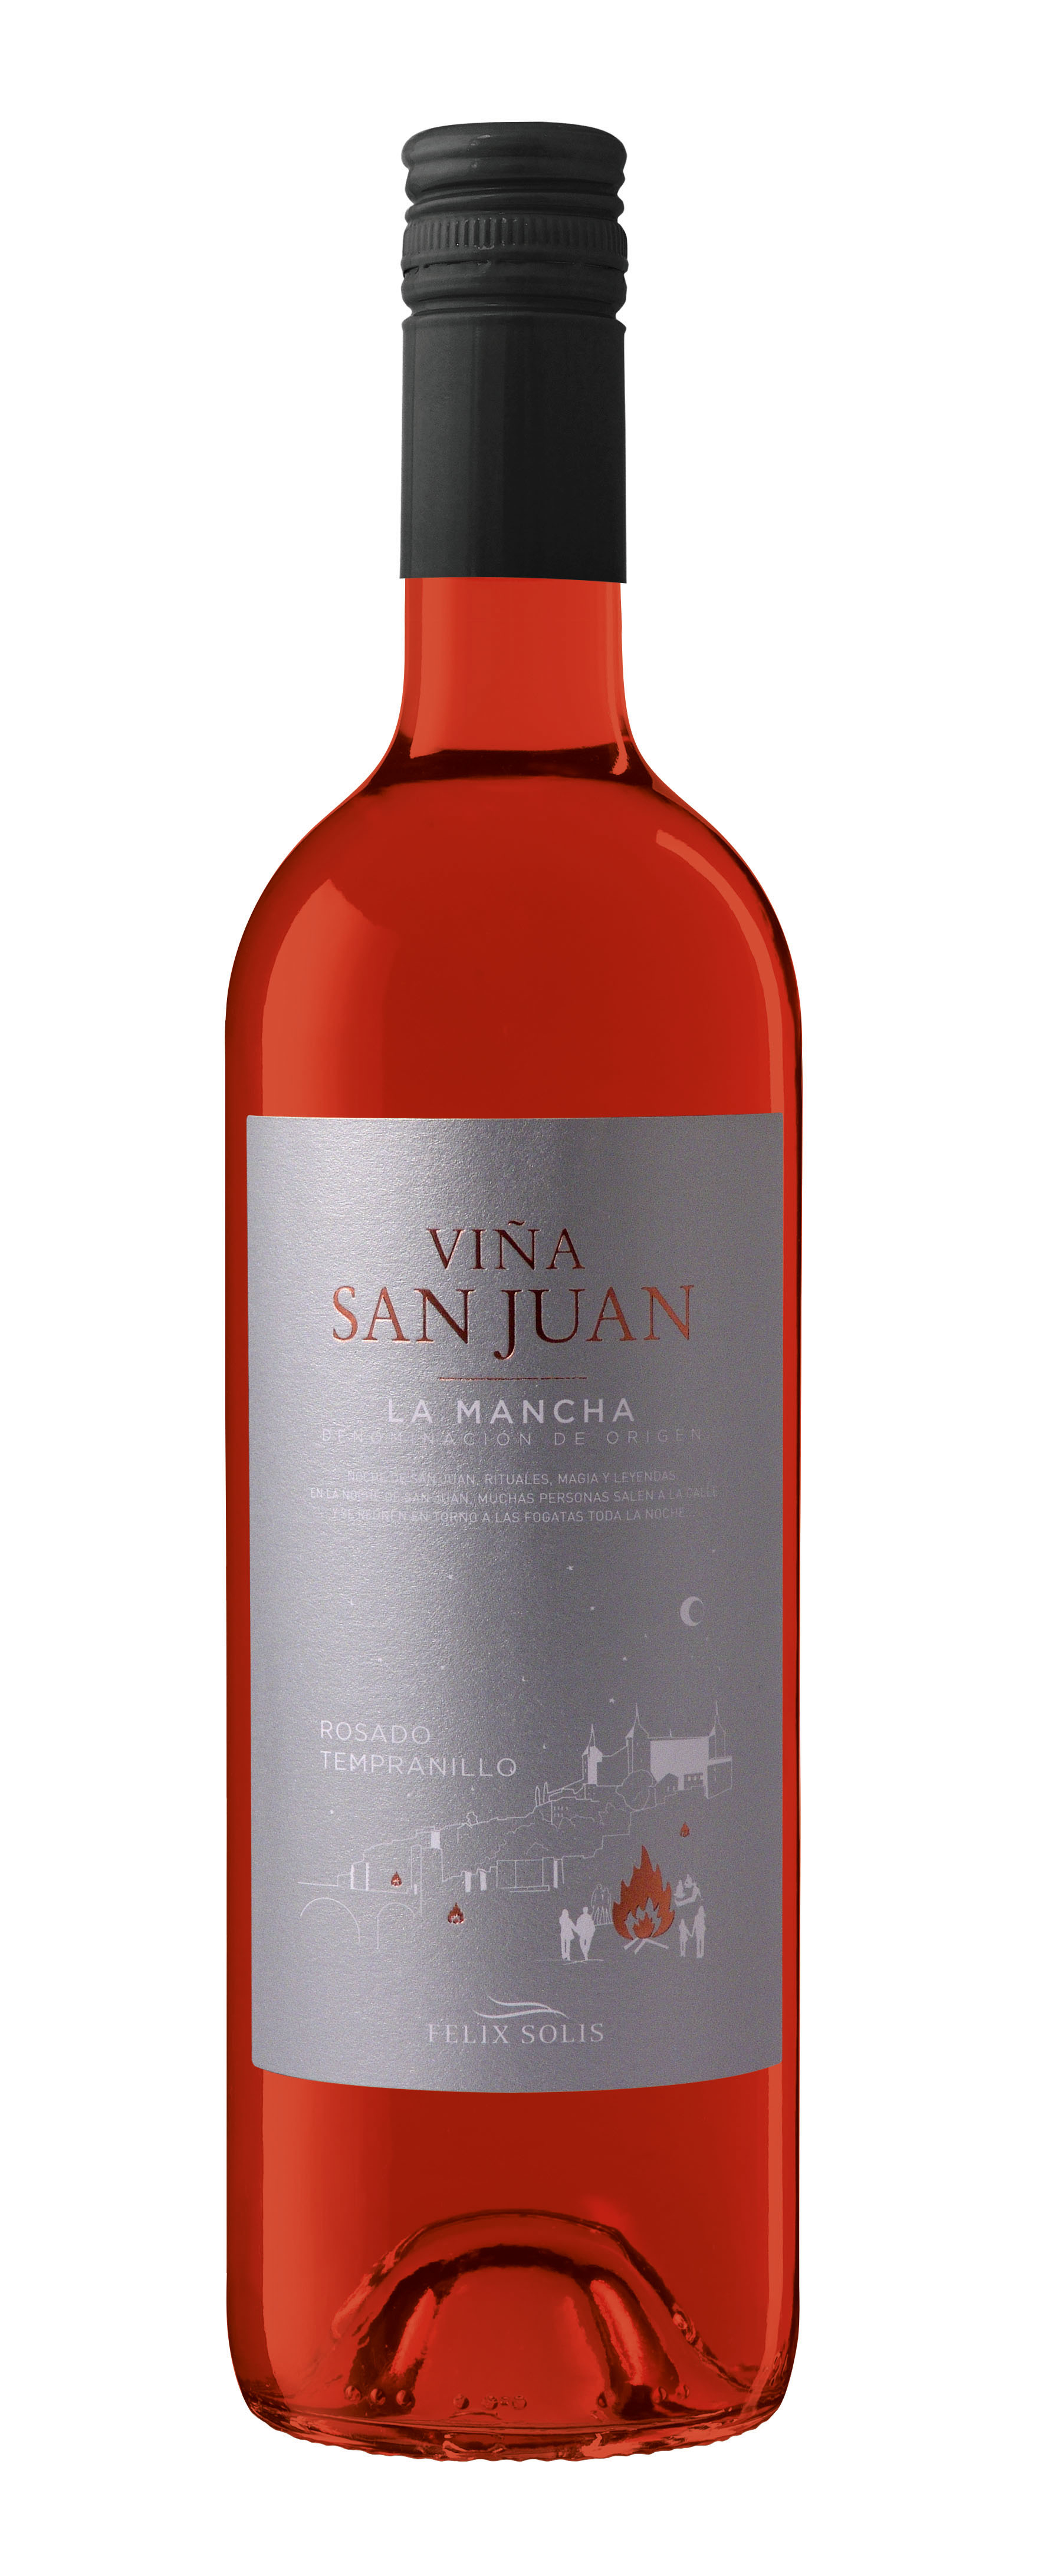 Vina San Juan rosado D.O.